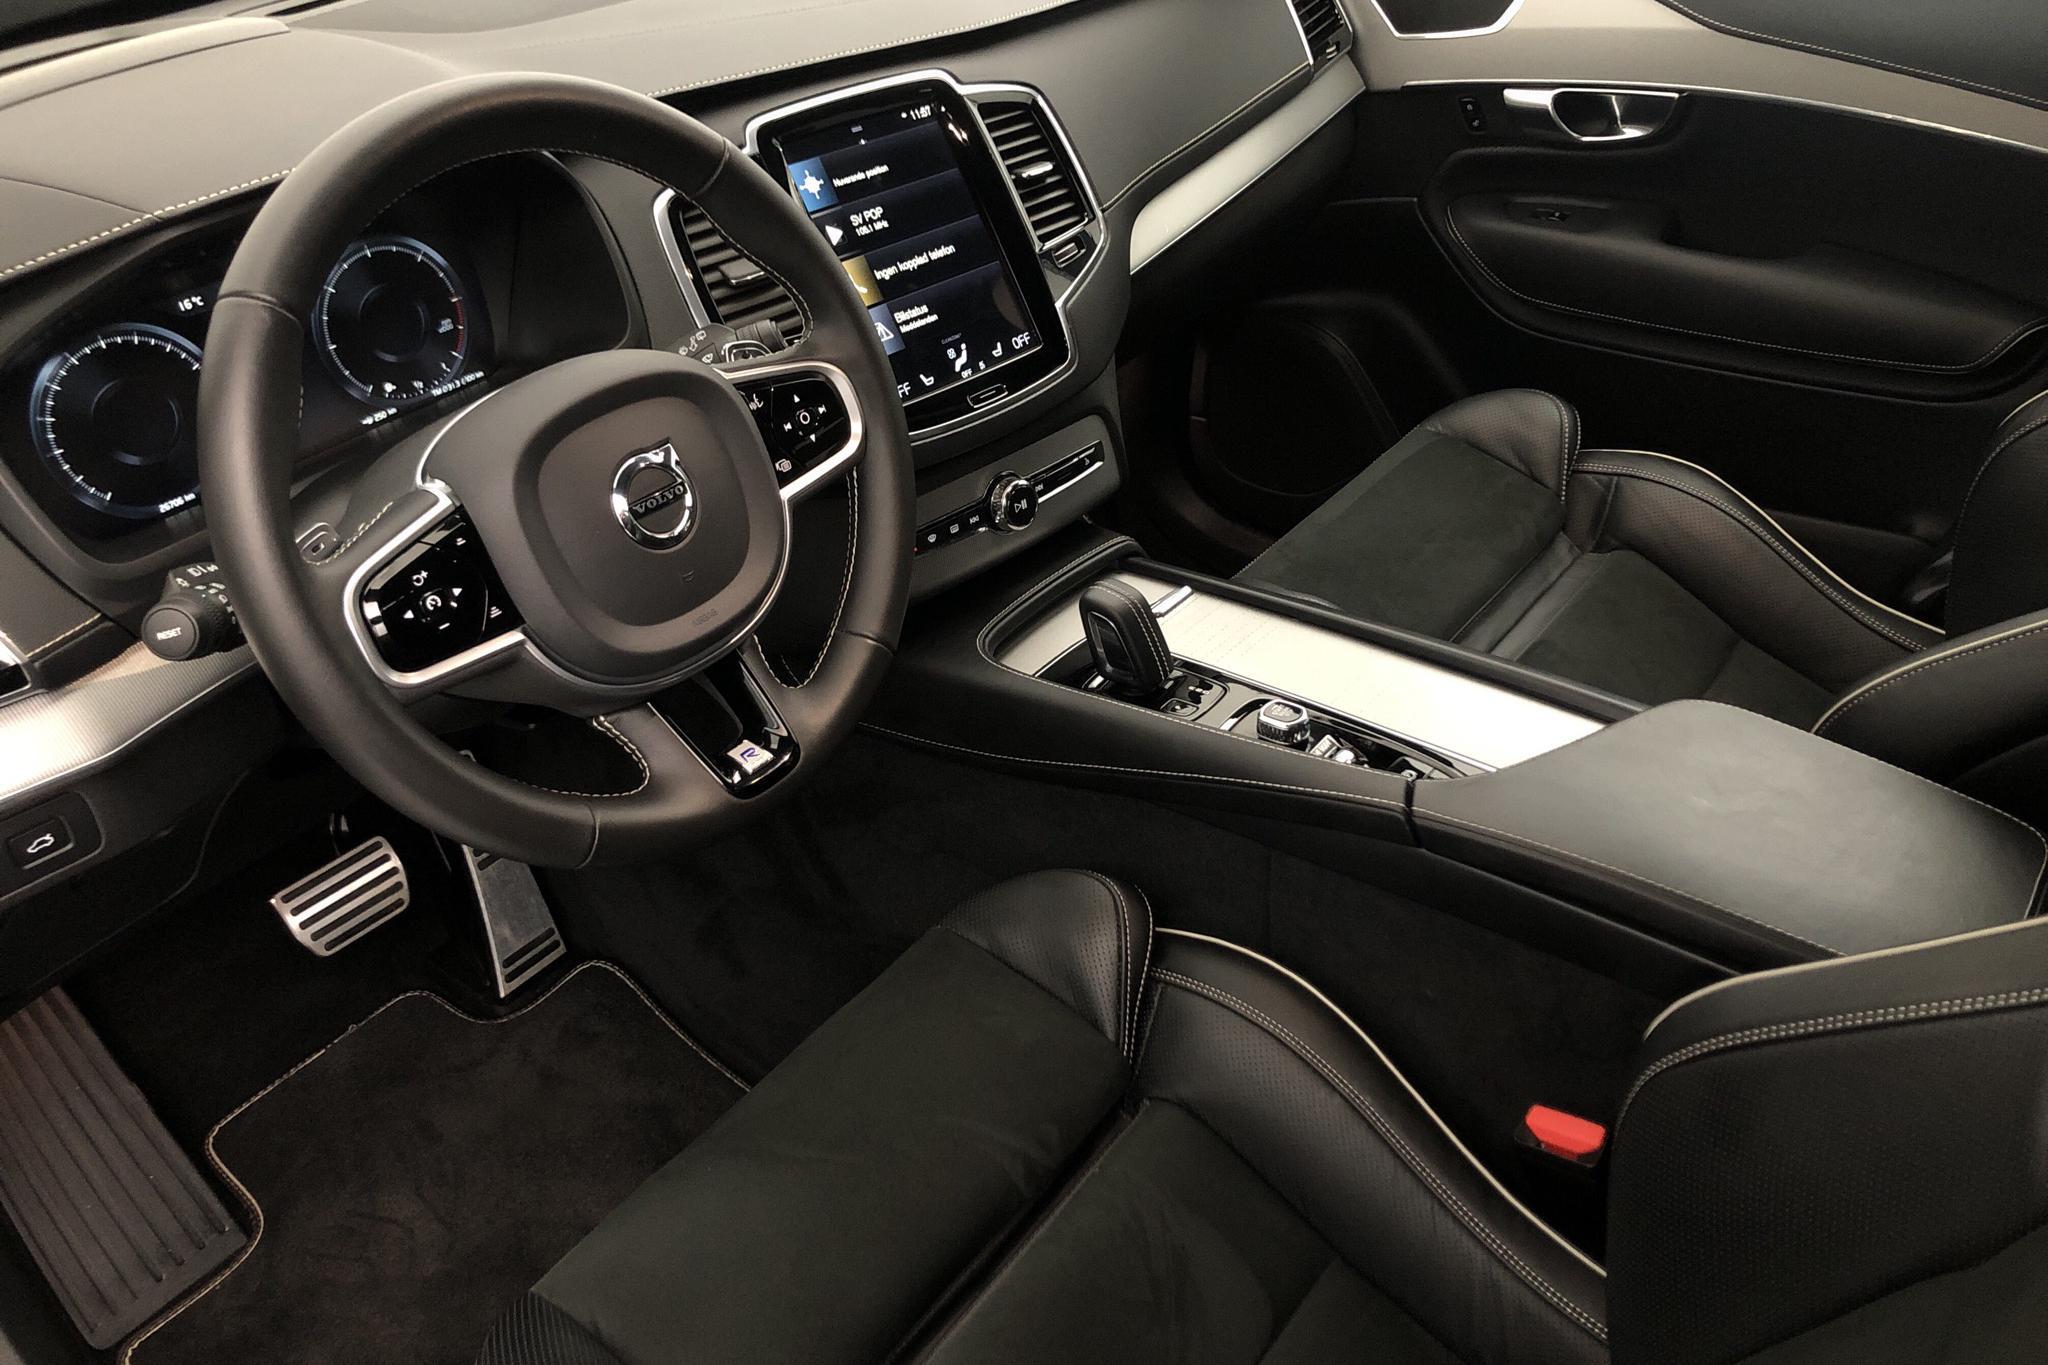 Volvo XC90 B5 AWD (235hk) - 26 710 km - Automatic - black - 2020